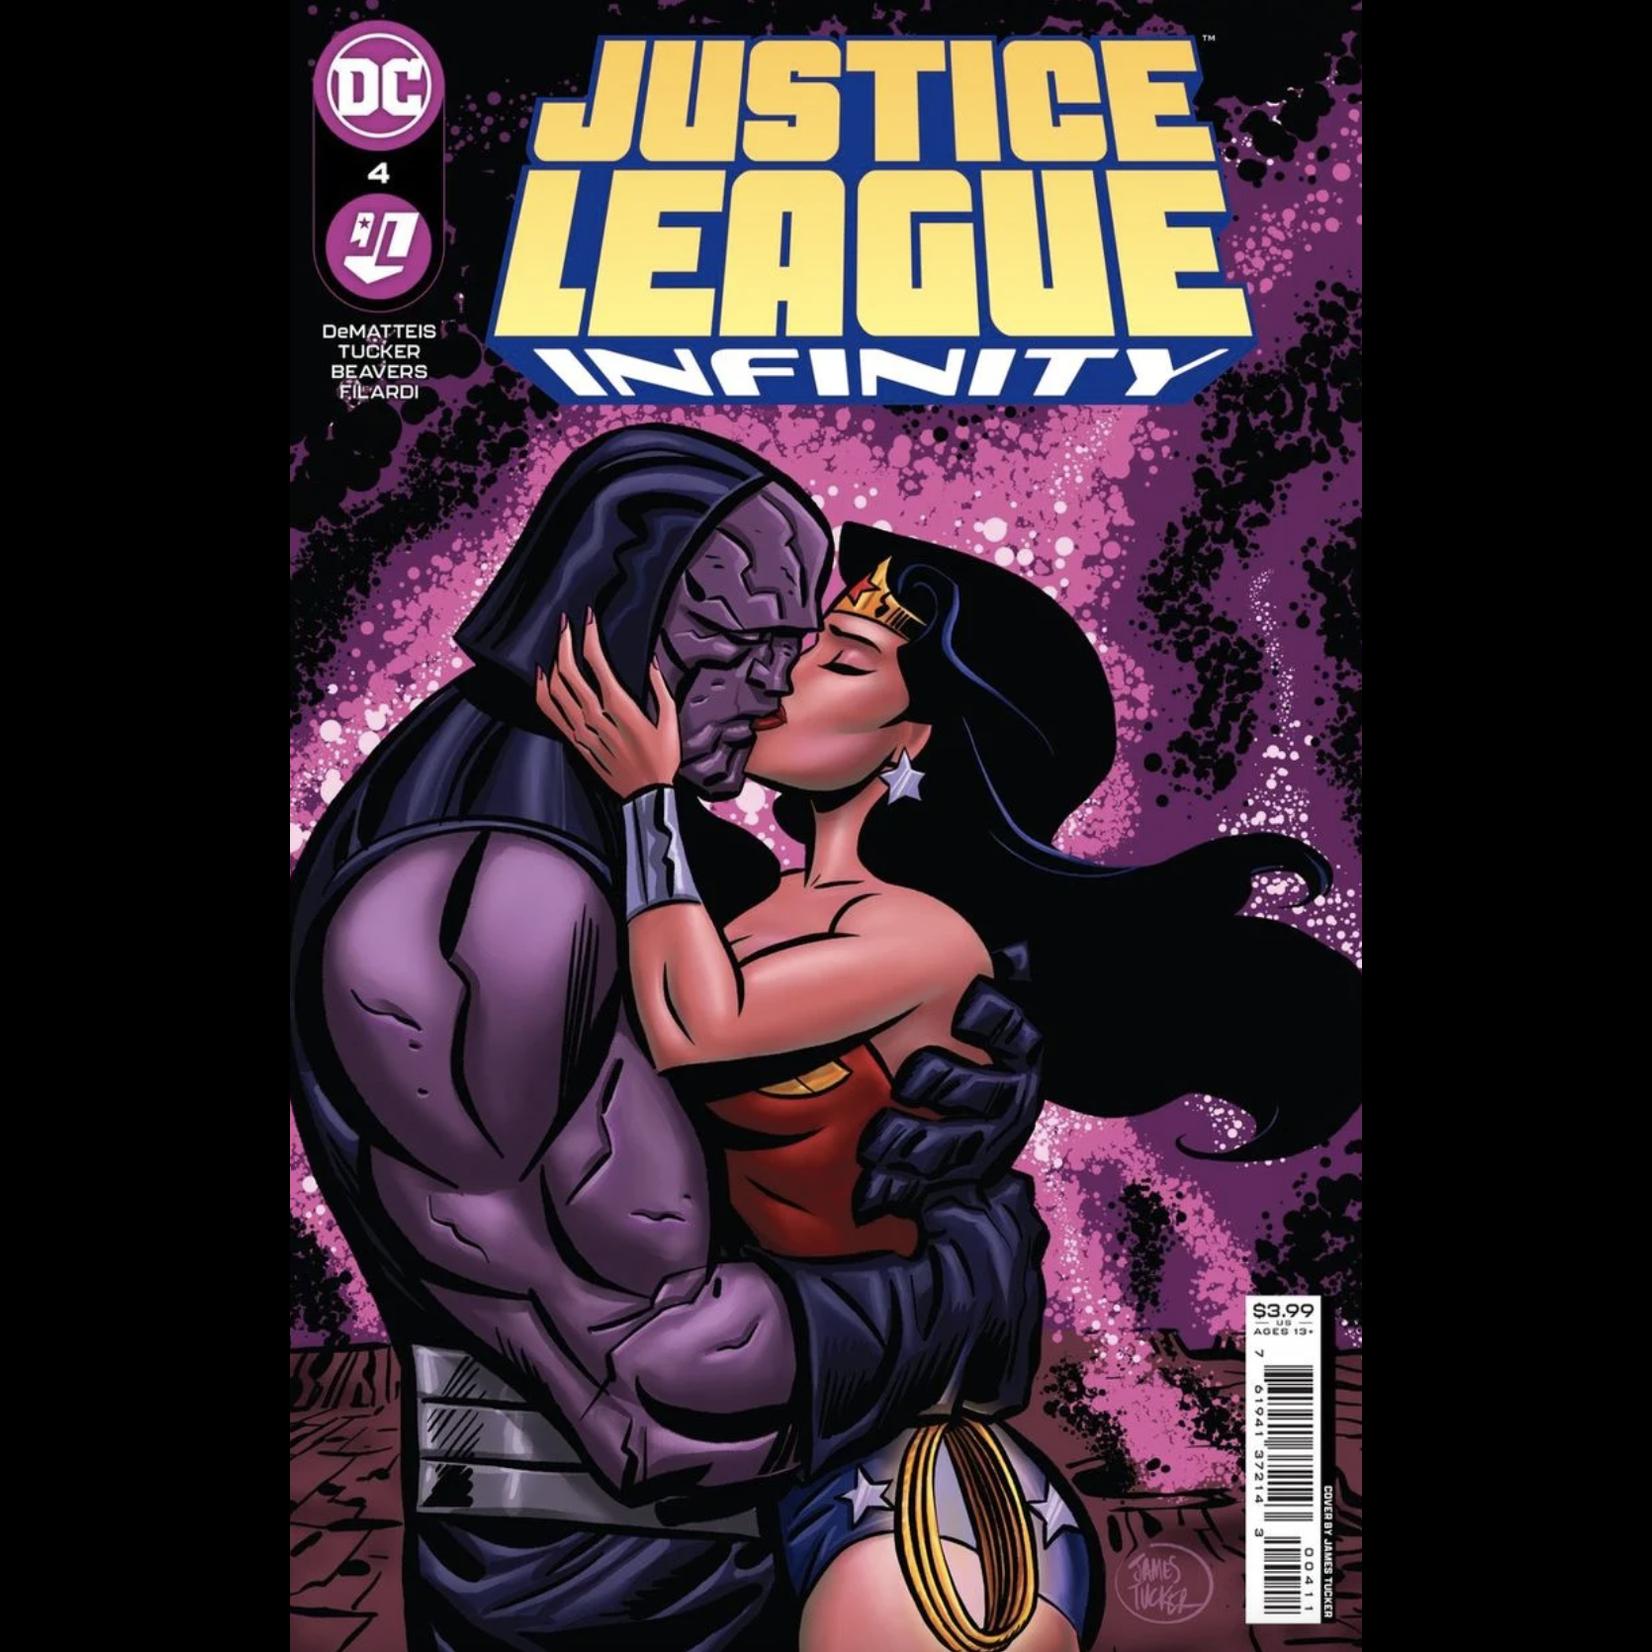 DC Comics Justice League Infinity #4